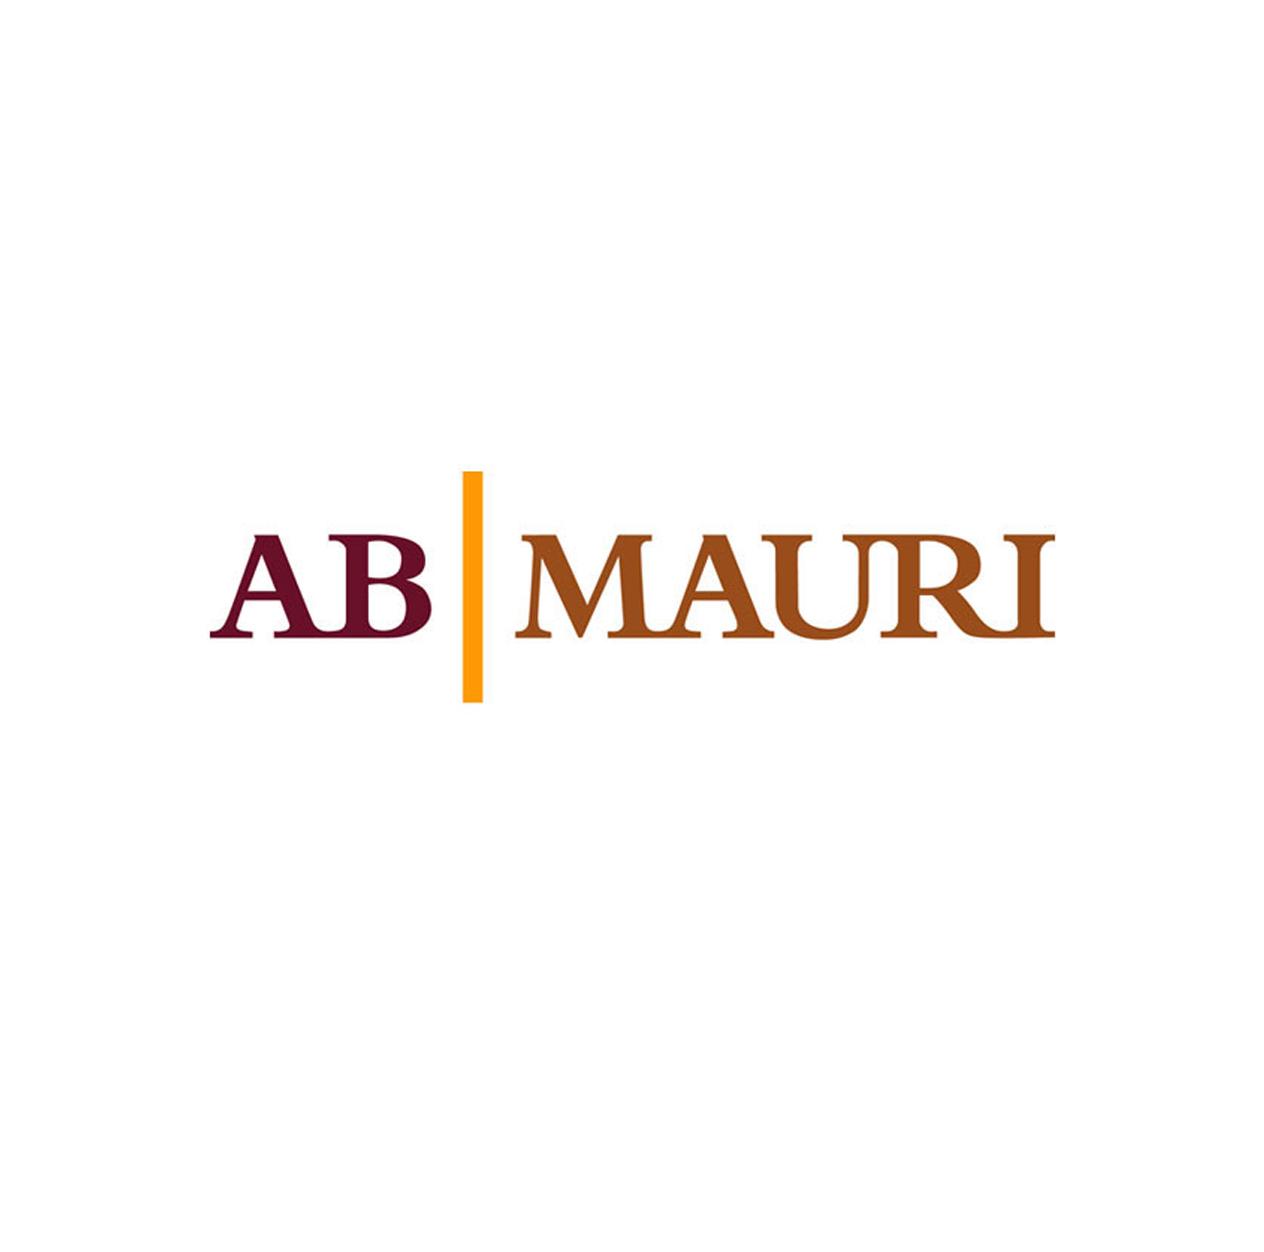 AB MAURI (ccell).jpg